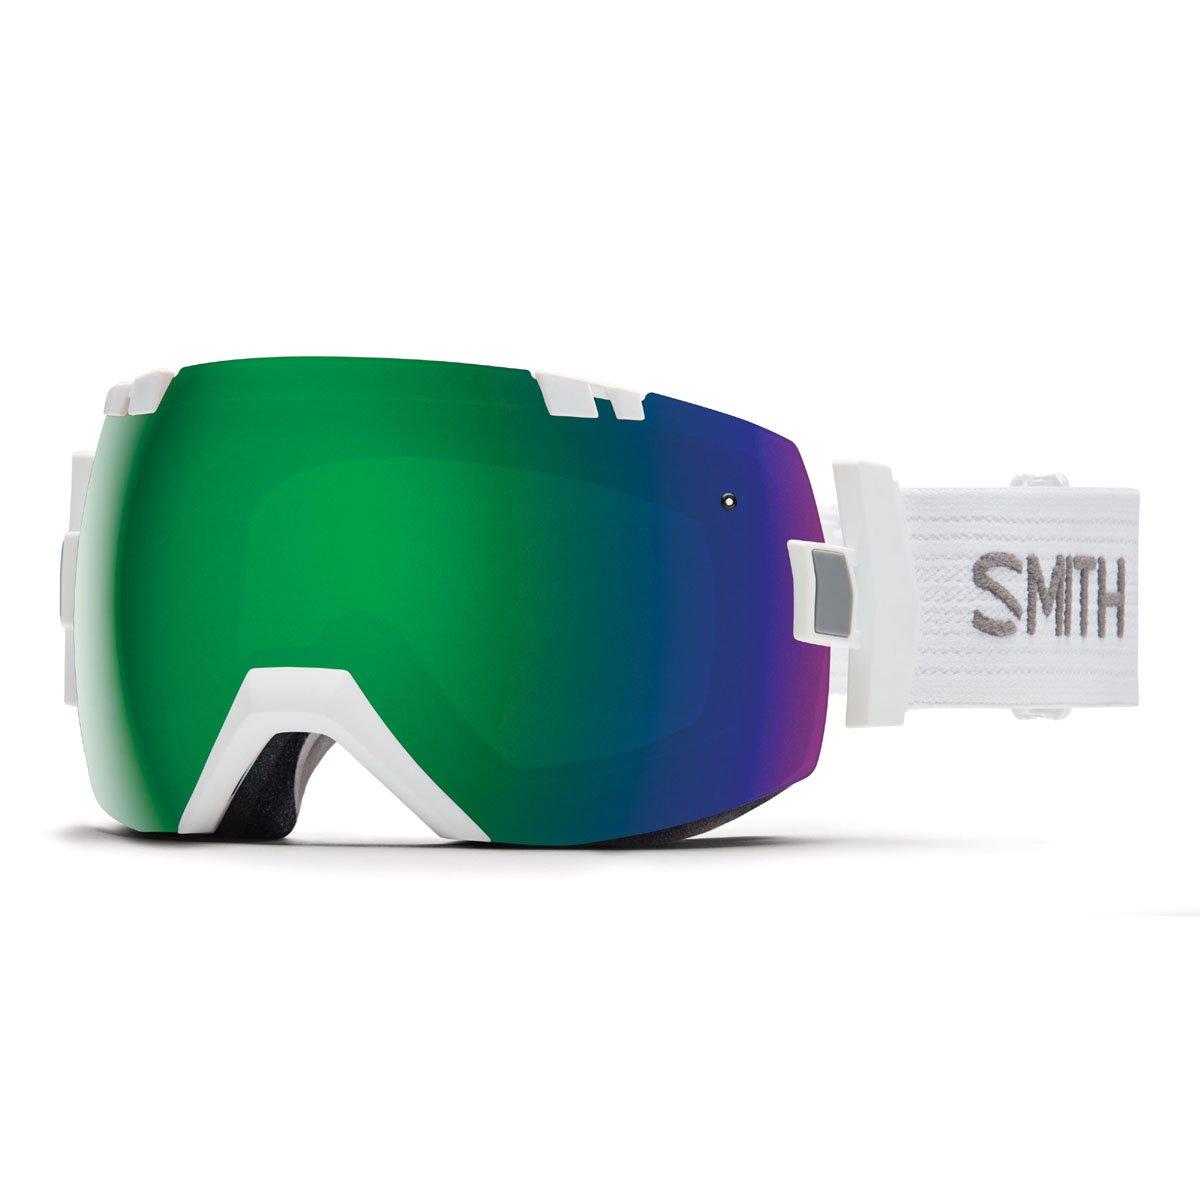 Smith Optics I/OX Brille